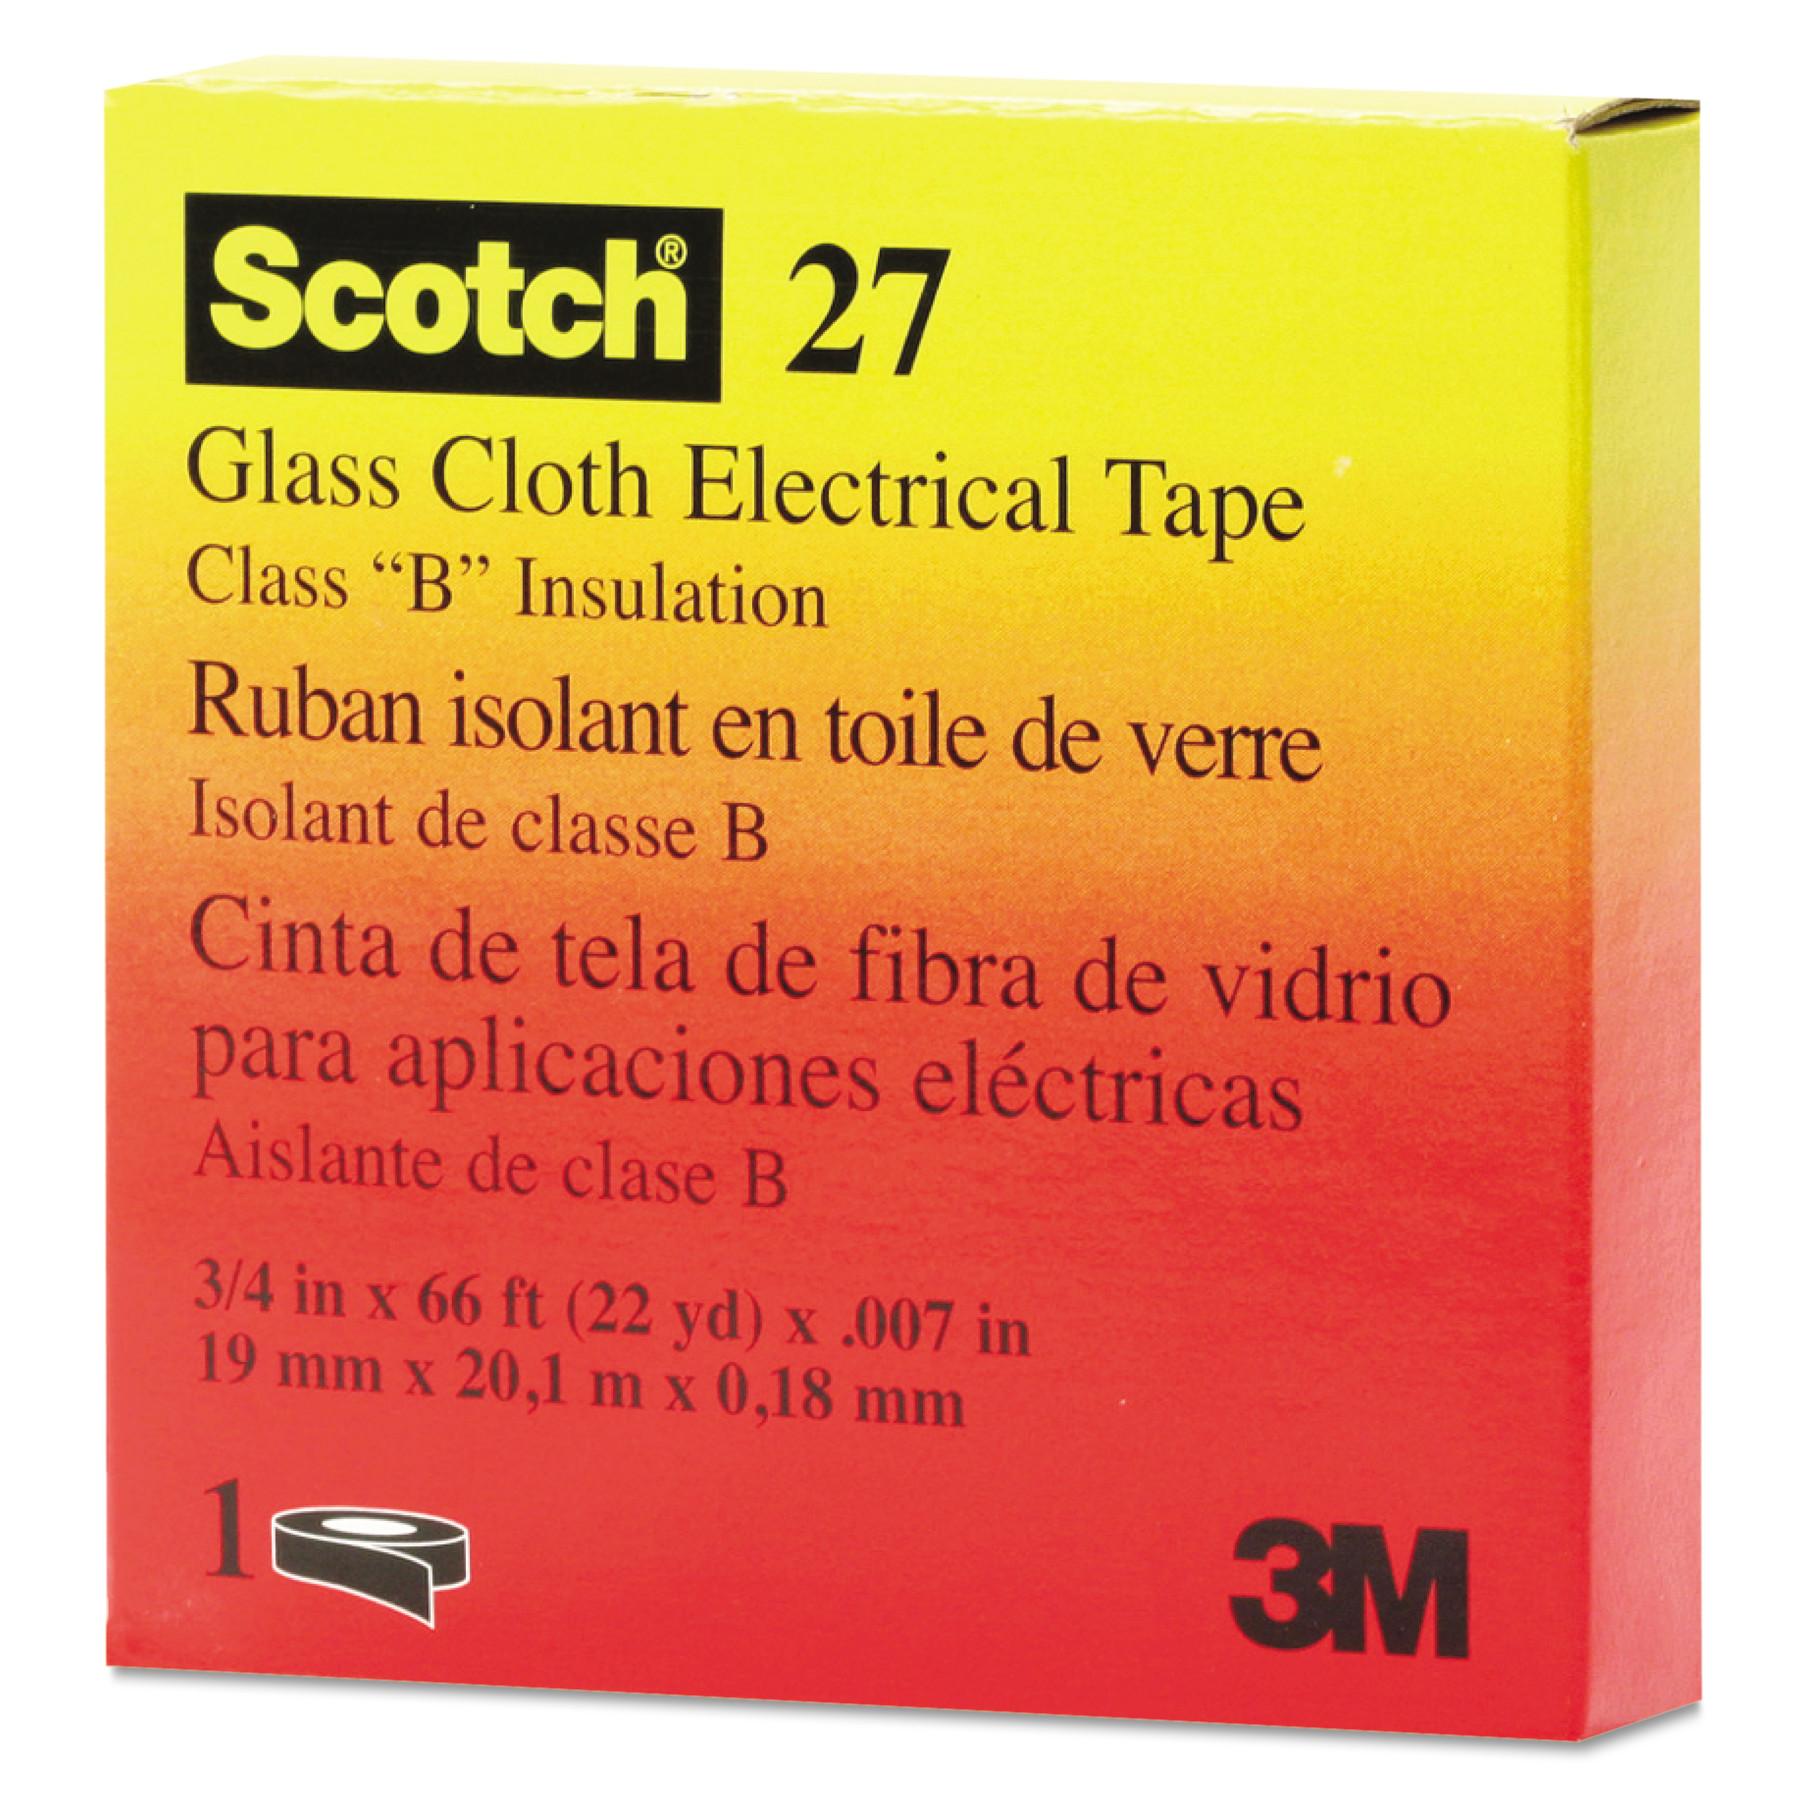 "3M Scotch 27 Glass Cloth Electrical Tape, 3/4"" x 66ft"